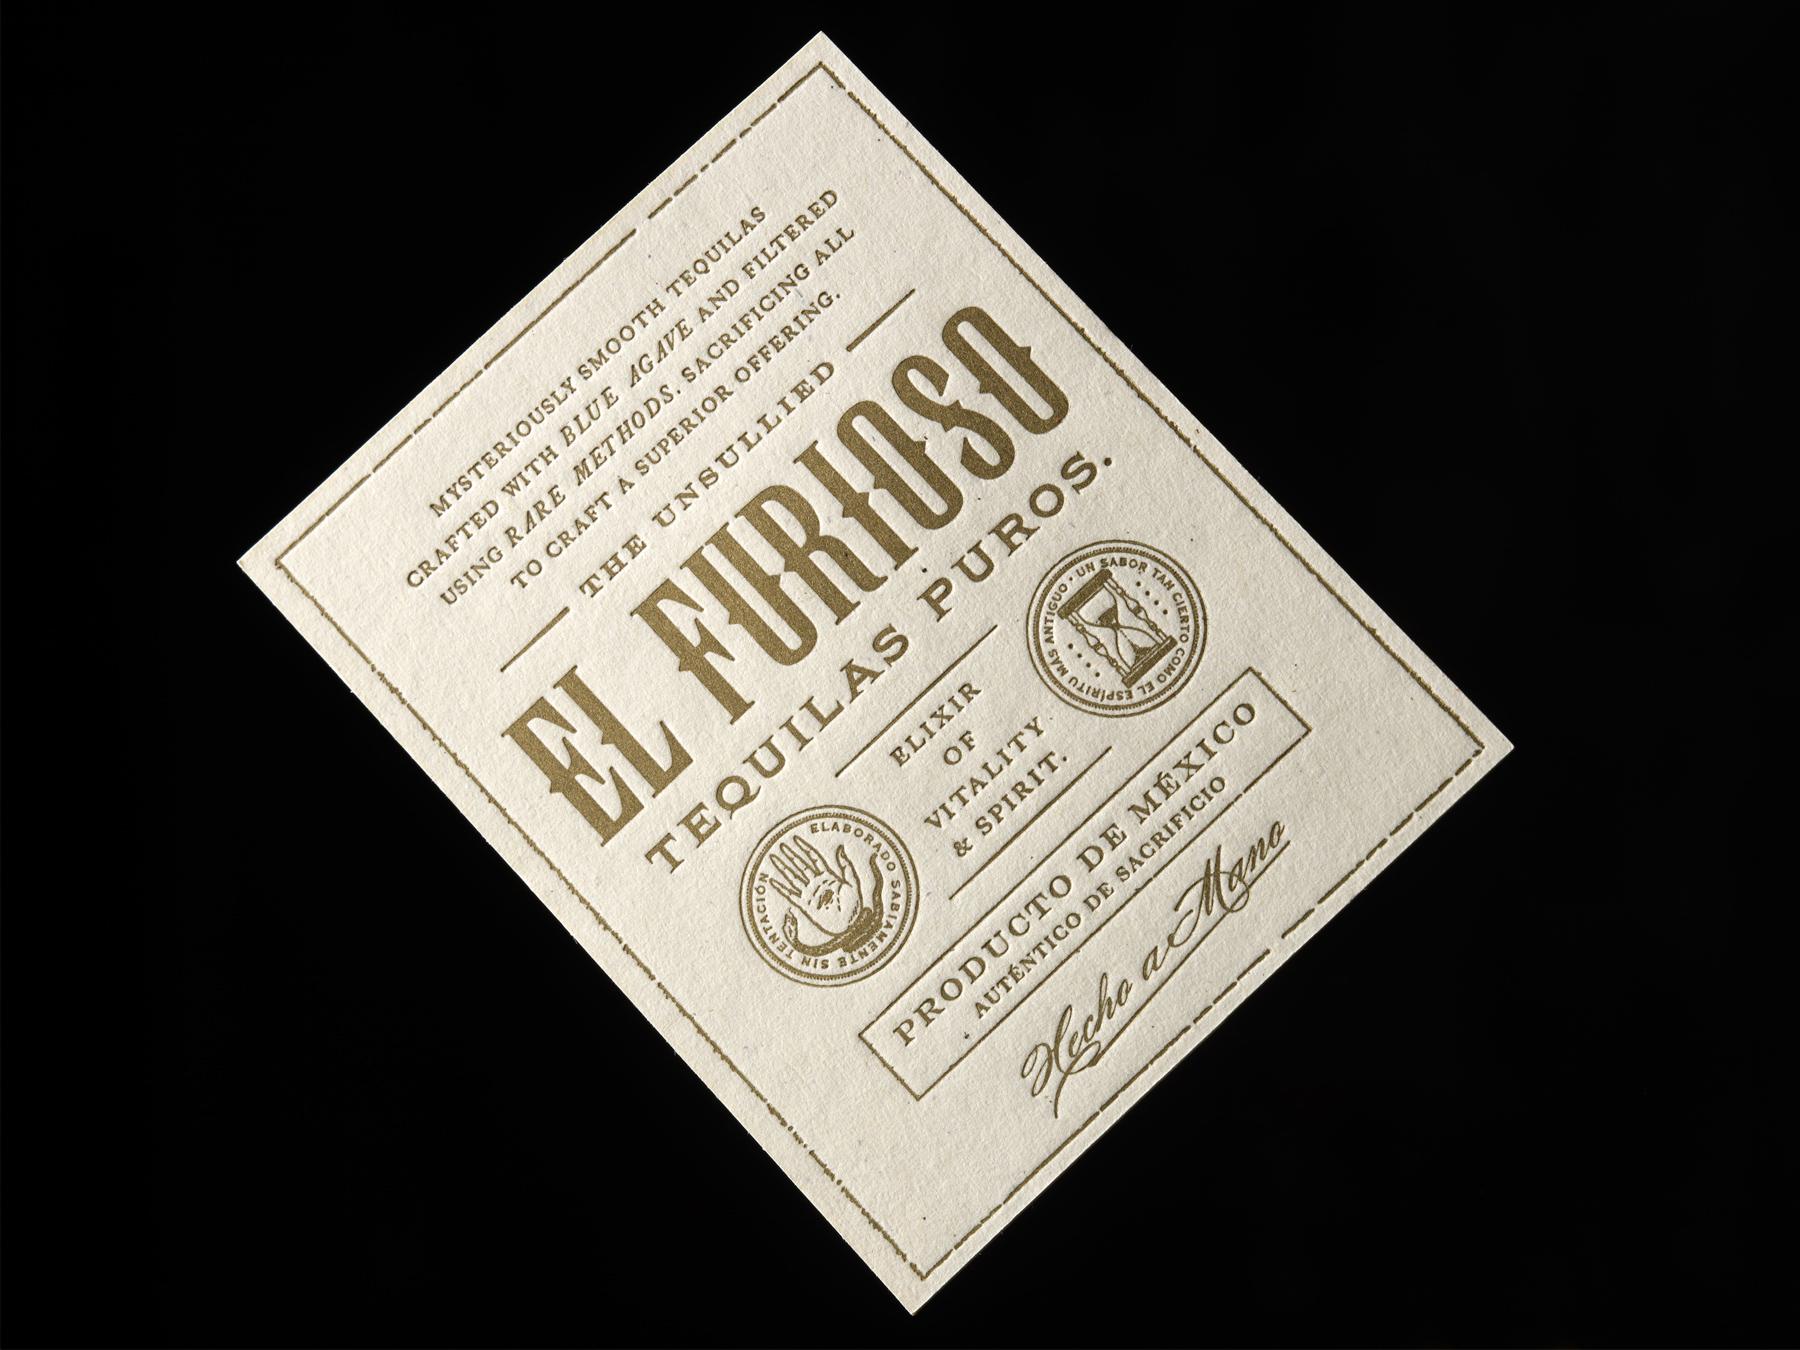 El-Furioso---Chad-Michael-Studio